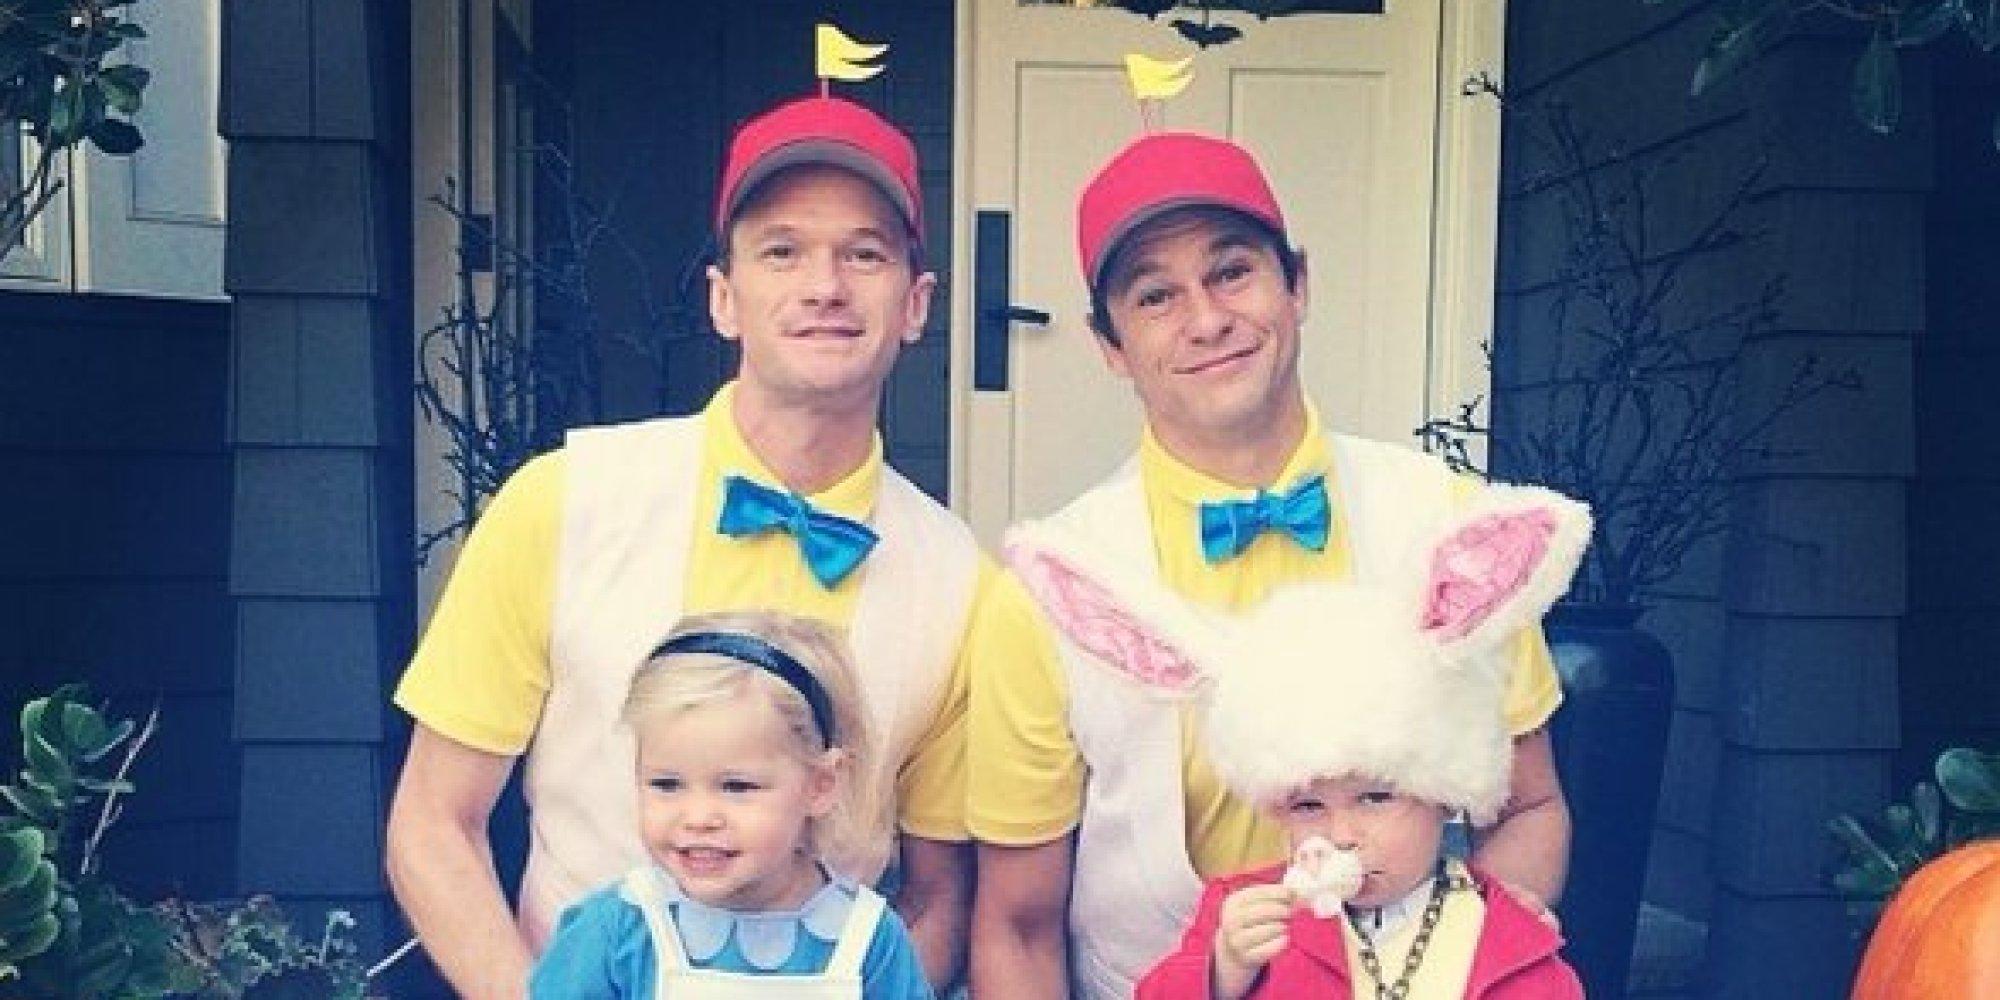 Alice In Wonderland Halloween Costume Family.Patrick Halloween Costume Straight Black Wig Pitstop Penny